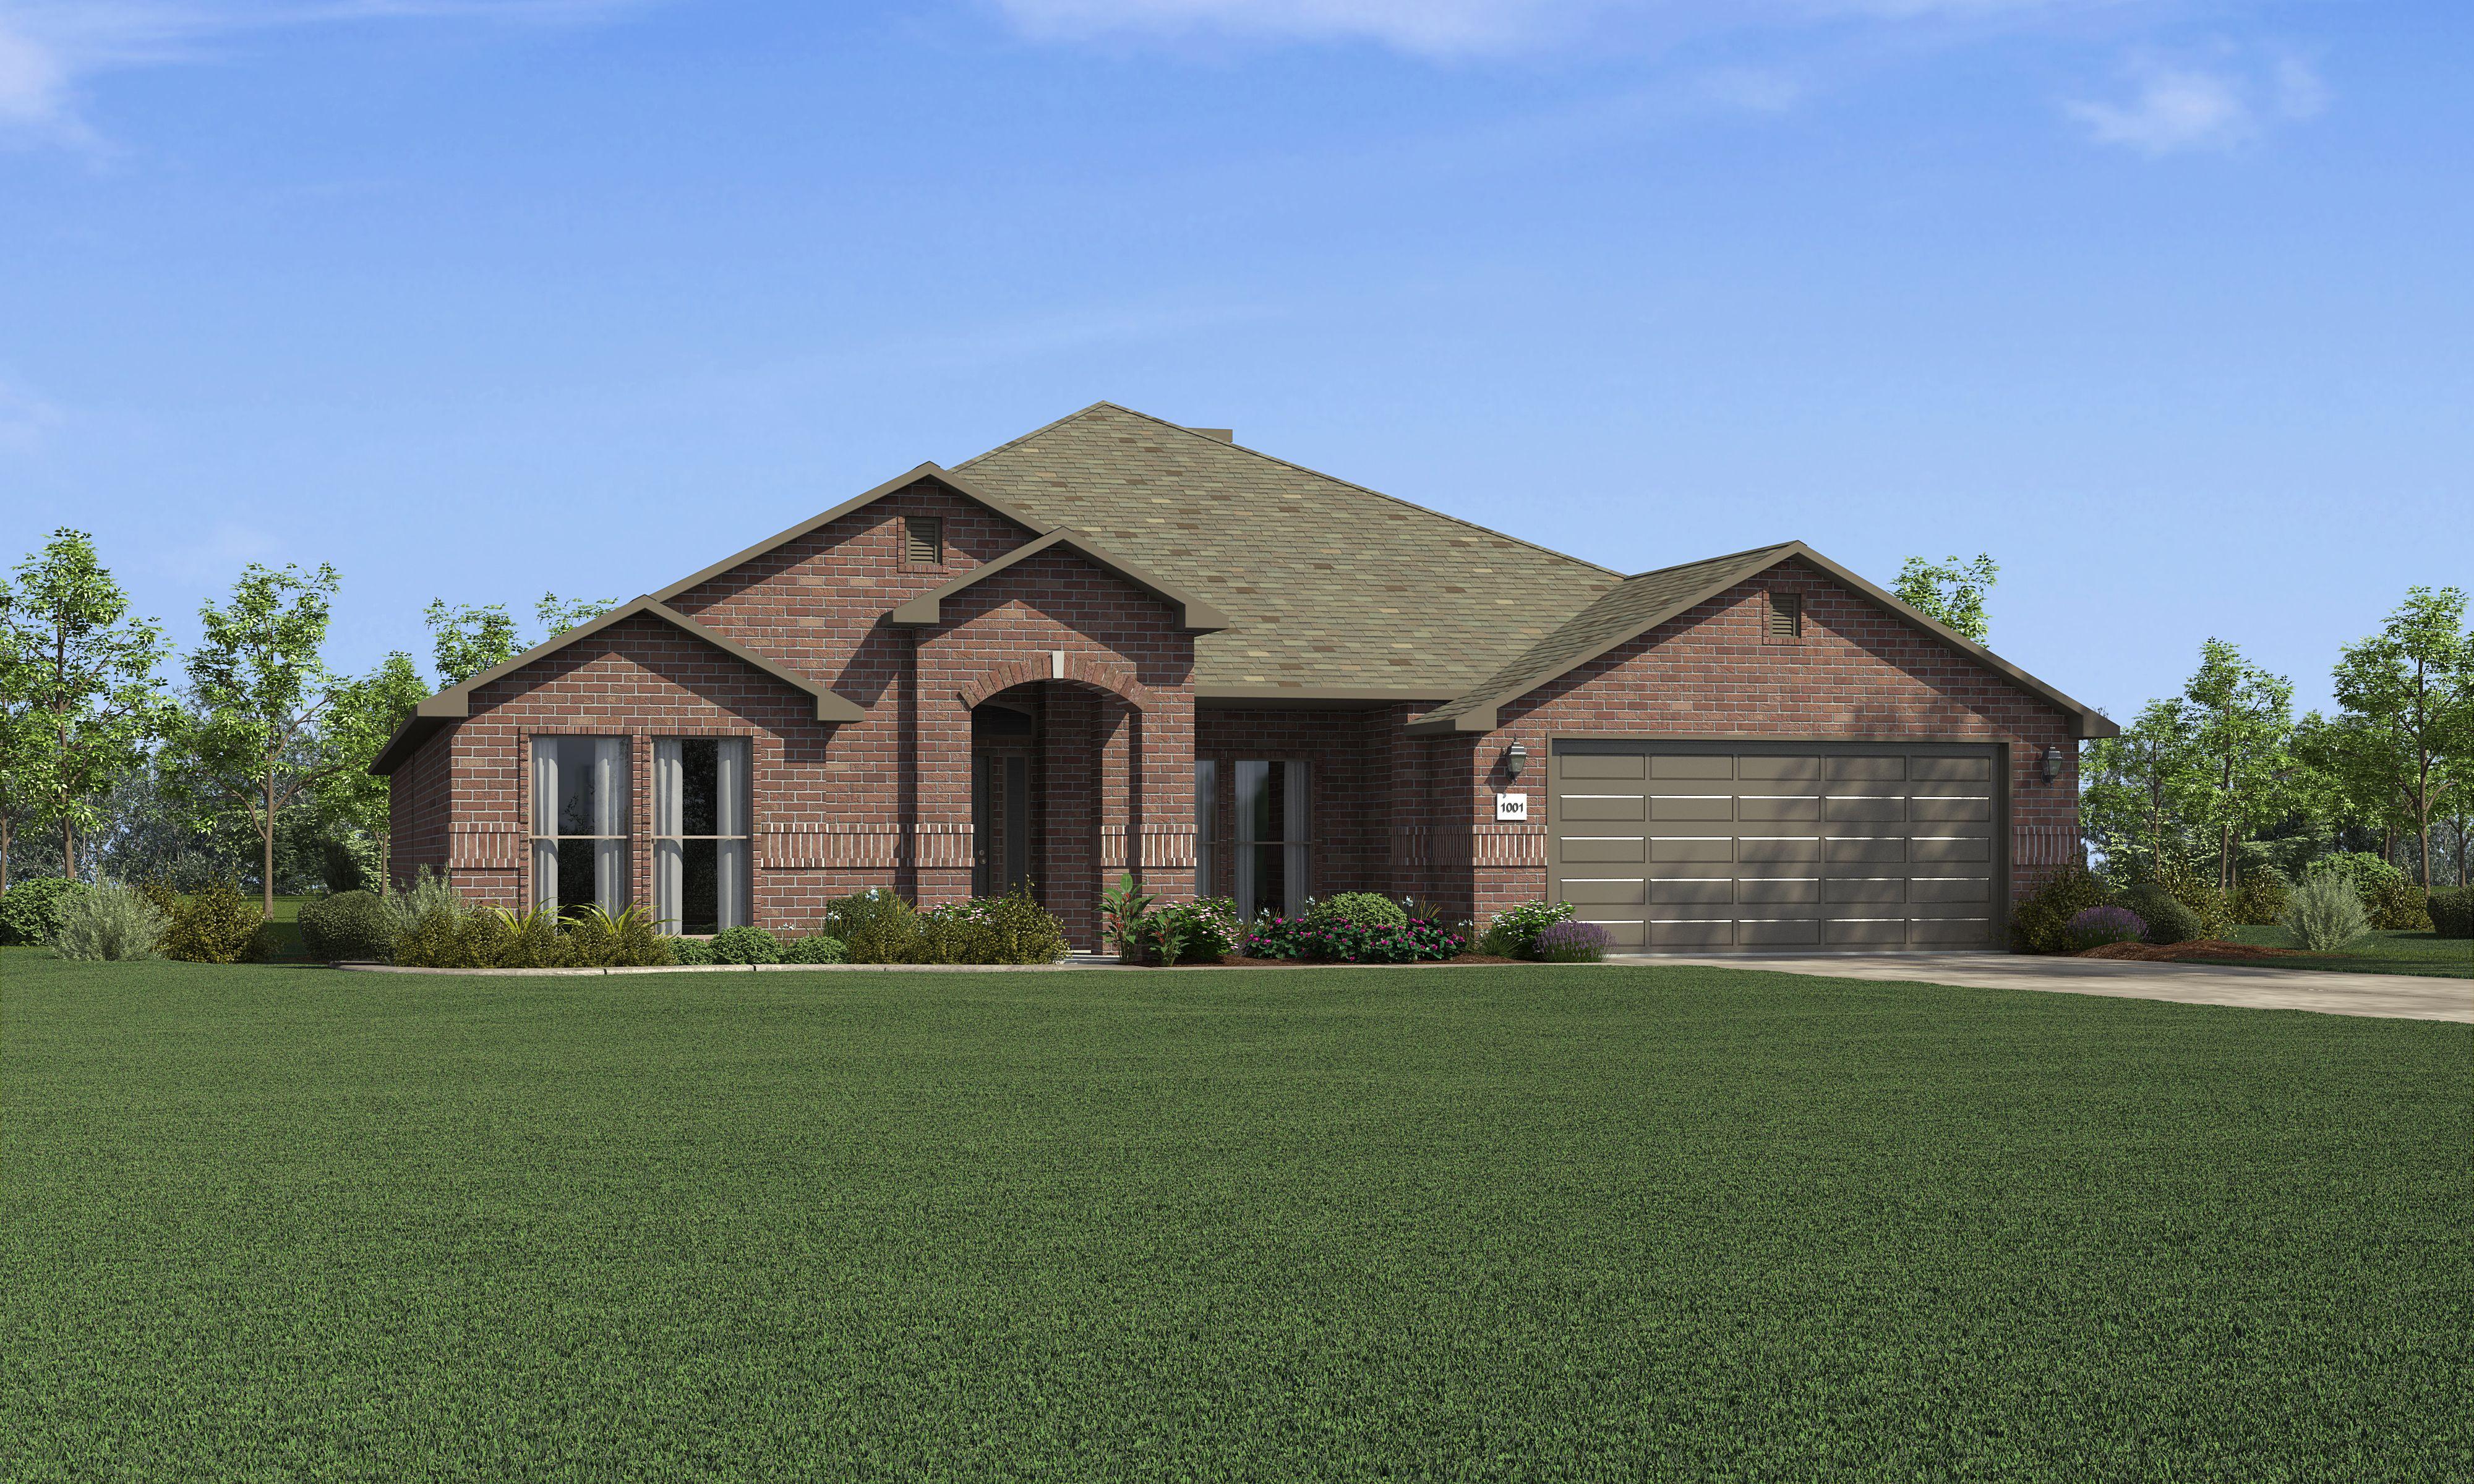 Single Family for Sale at Bella Mia Estates - Rosie 12502 Hudson Ave Lubbock, Texas 79423 United States